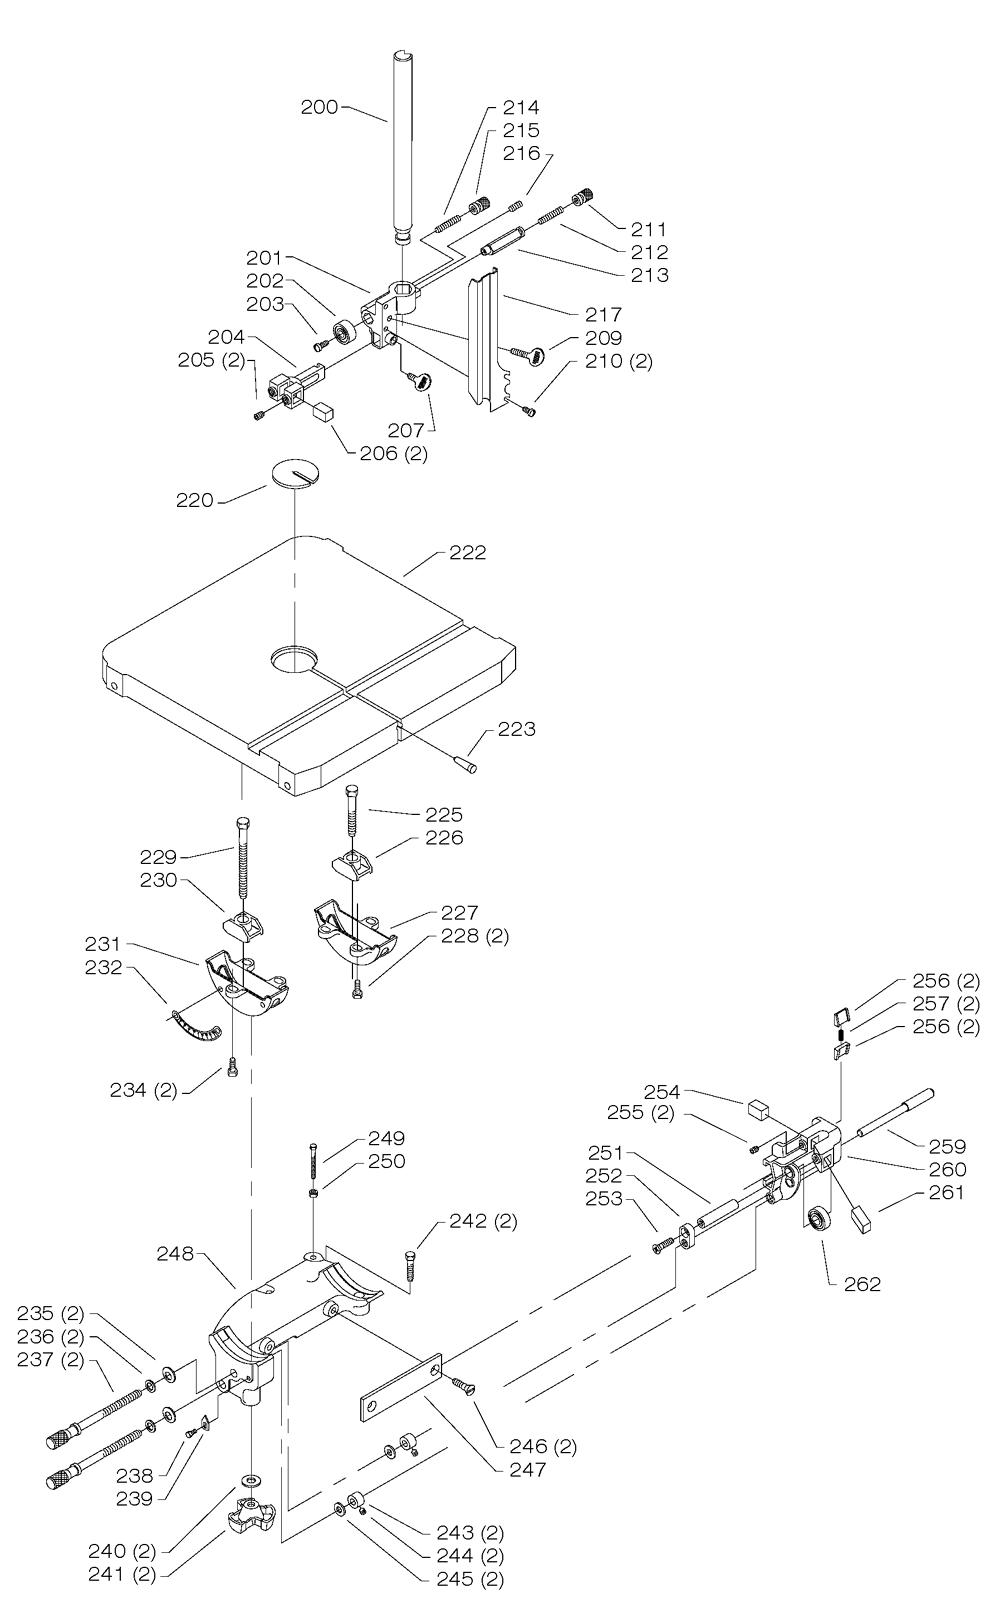 Delta-28-306-Type-1-Parts-3639-PBBreak Down